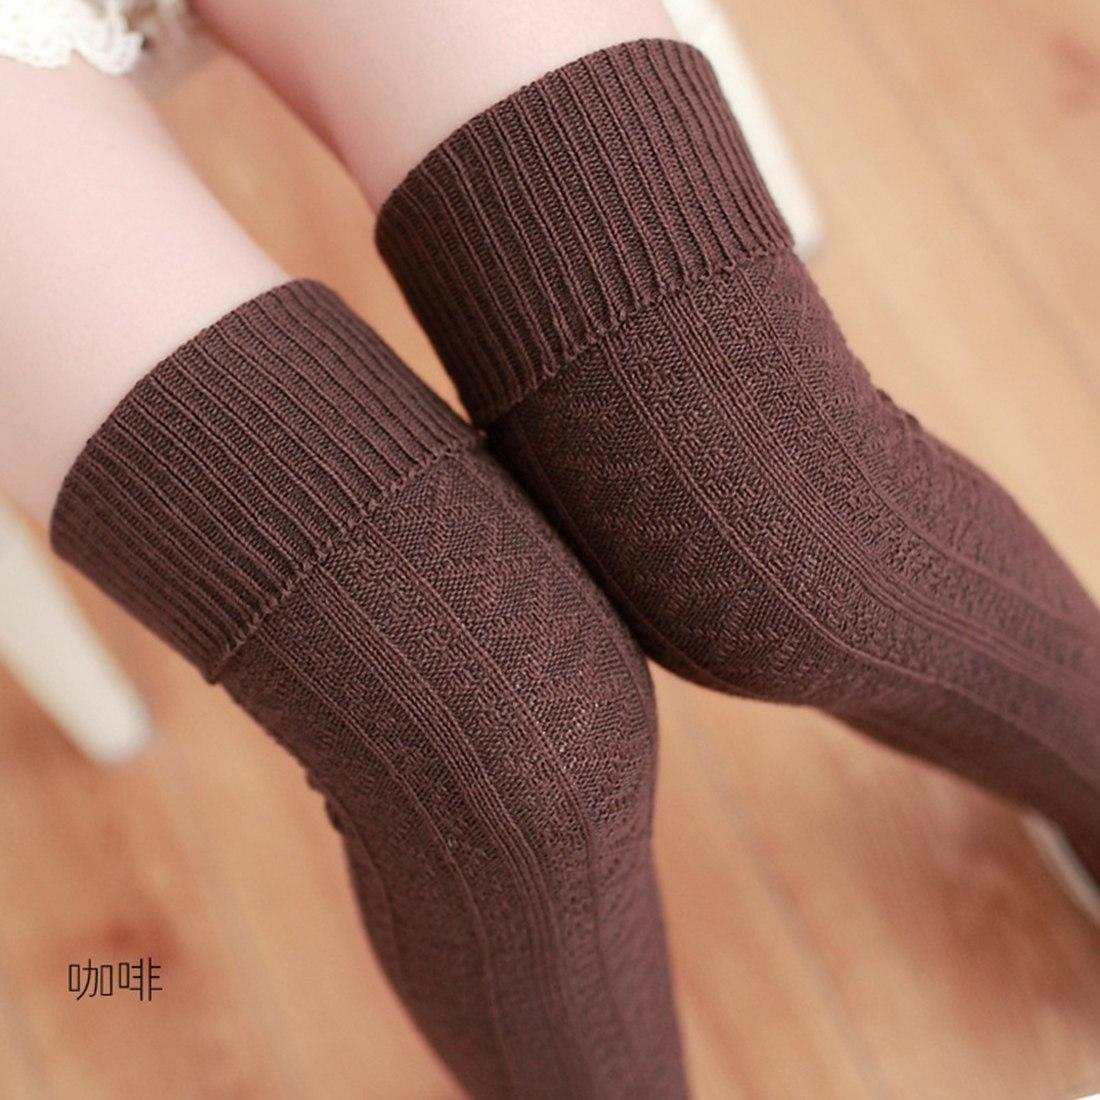 14e8eece4 2019 Beige Brown Red Gray Black Knee Socks Women Warm Thigh High Stockings  Stocking 2017 Fashion Sexy Cotton Long Socks Winter Medias From Caesarl